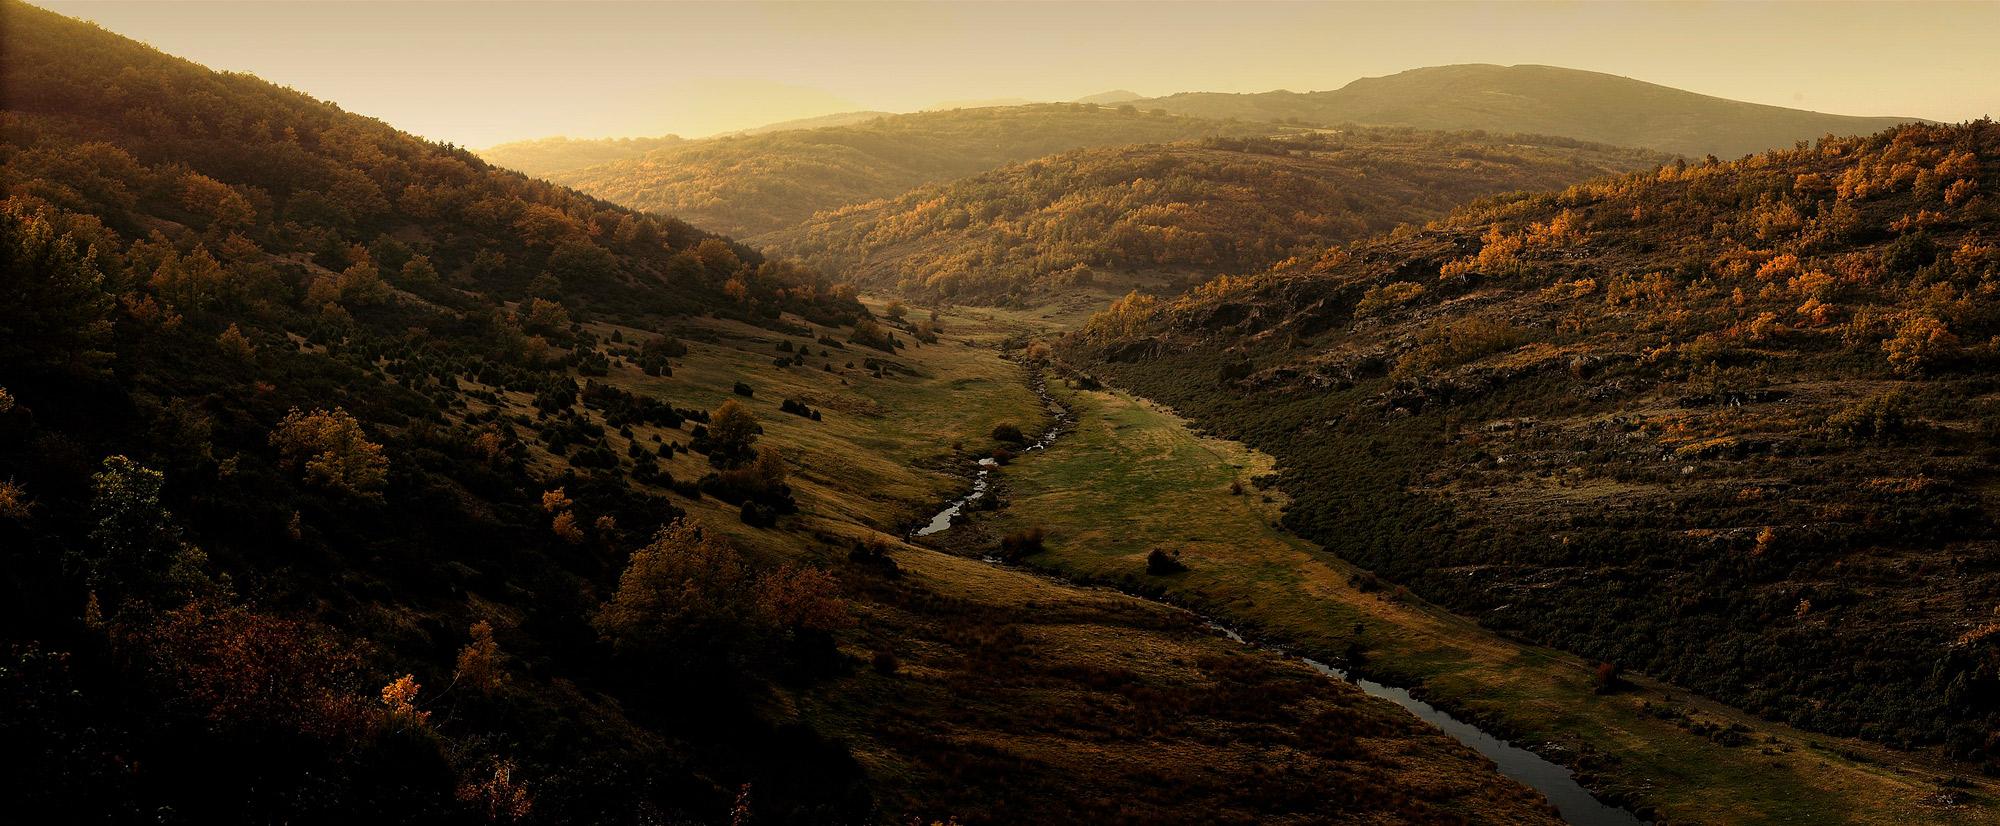 Sierra Norte de Guadalajara 1.jpg